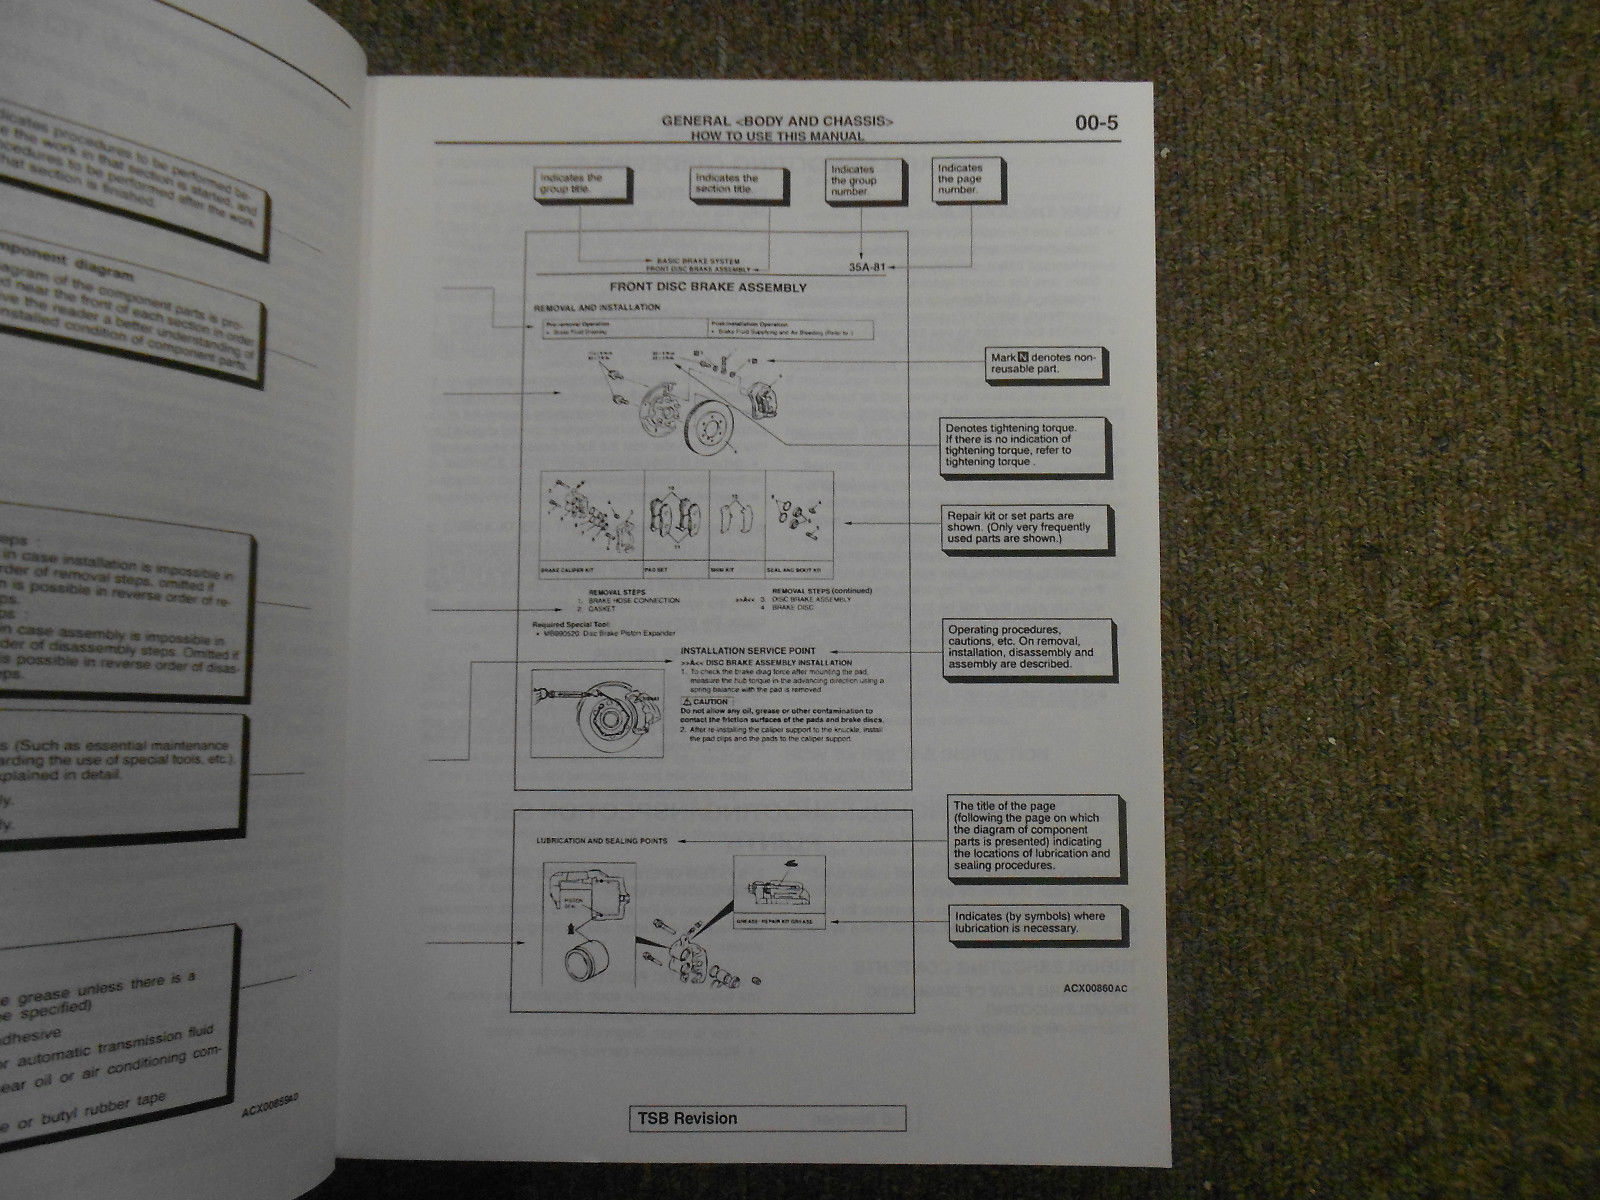 2001 MITSUBISHI Eclipse Spyder VOL 1 Technical Bulletins Service Manual SET OEM image 4